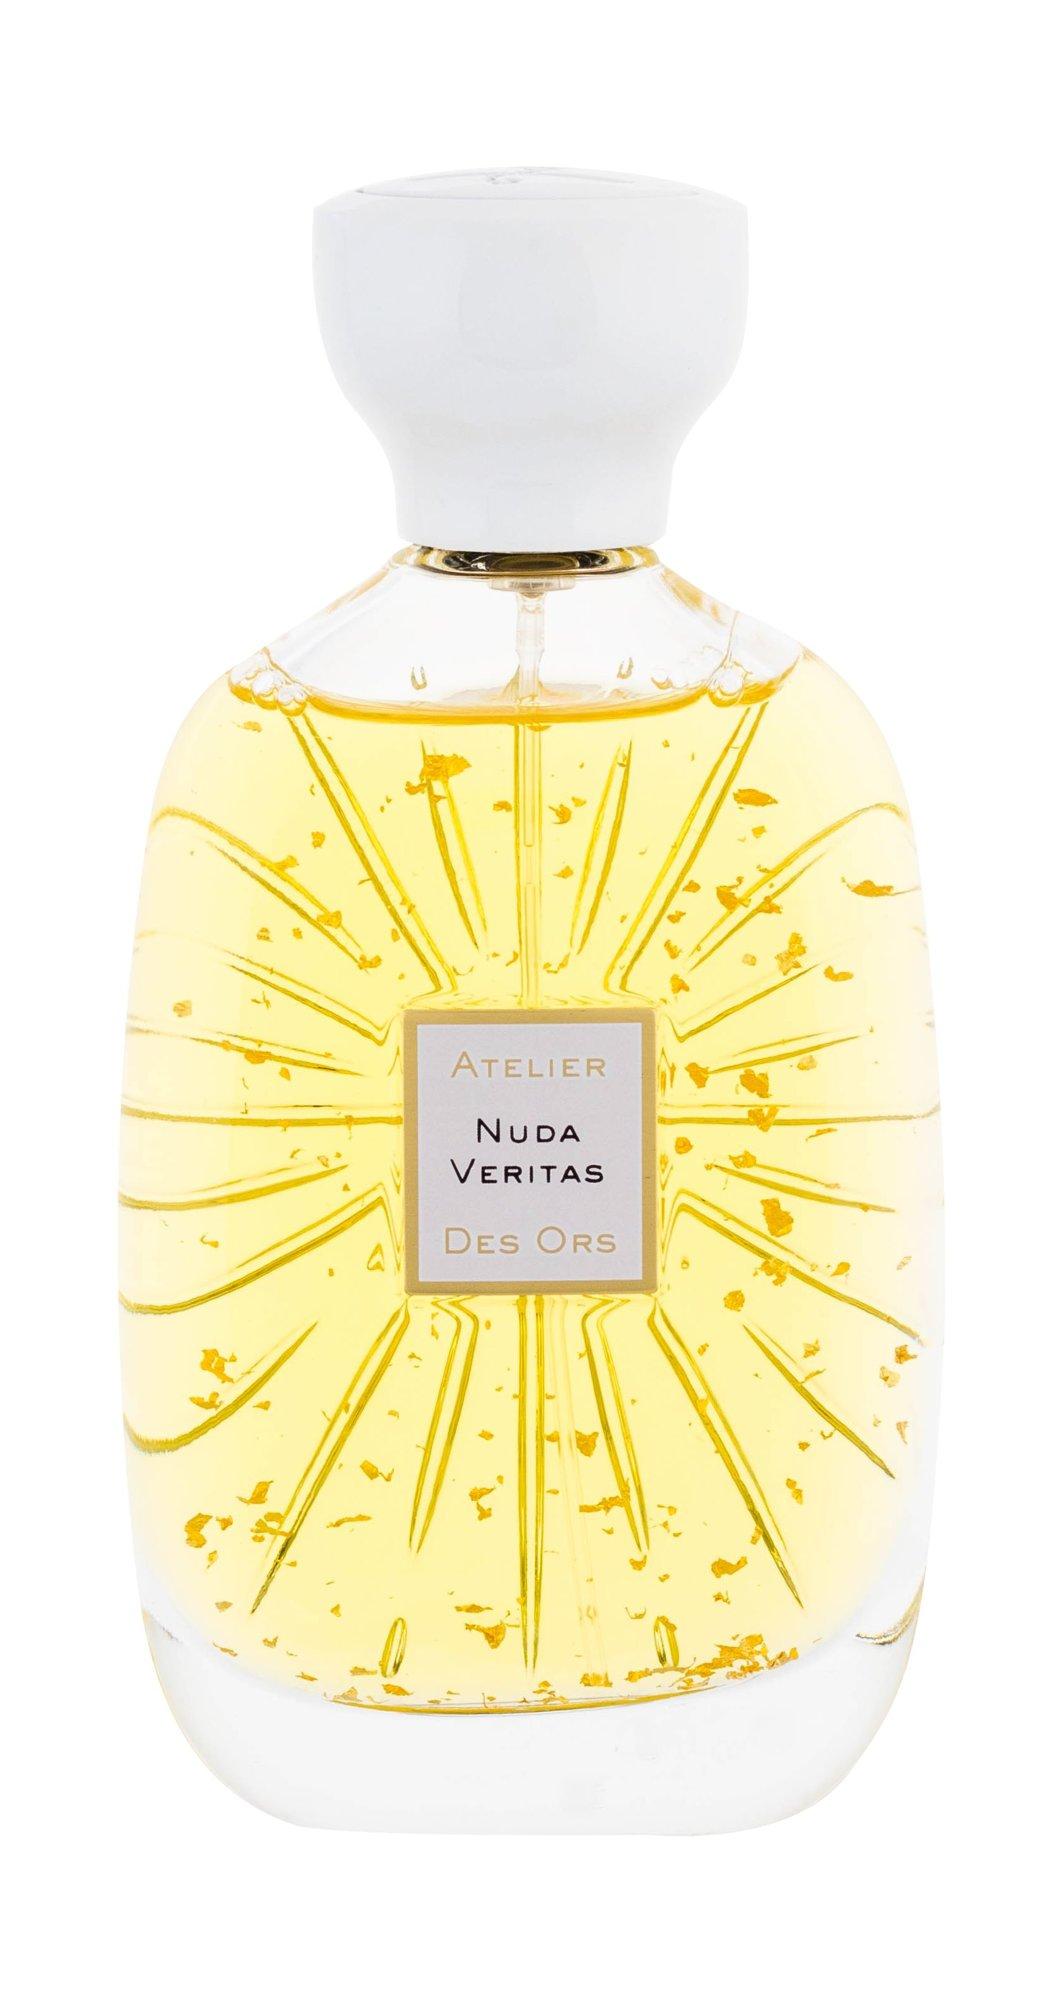 Atelier des Ors Nuda Veritas Eau de Parfum 100ml